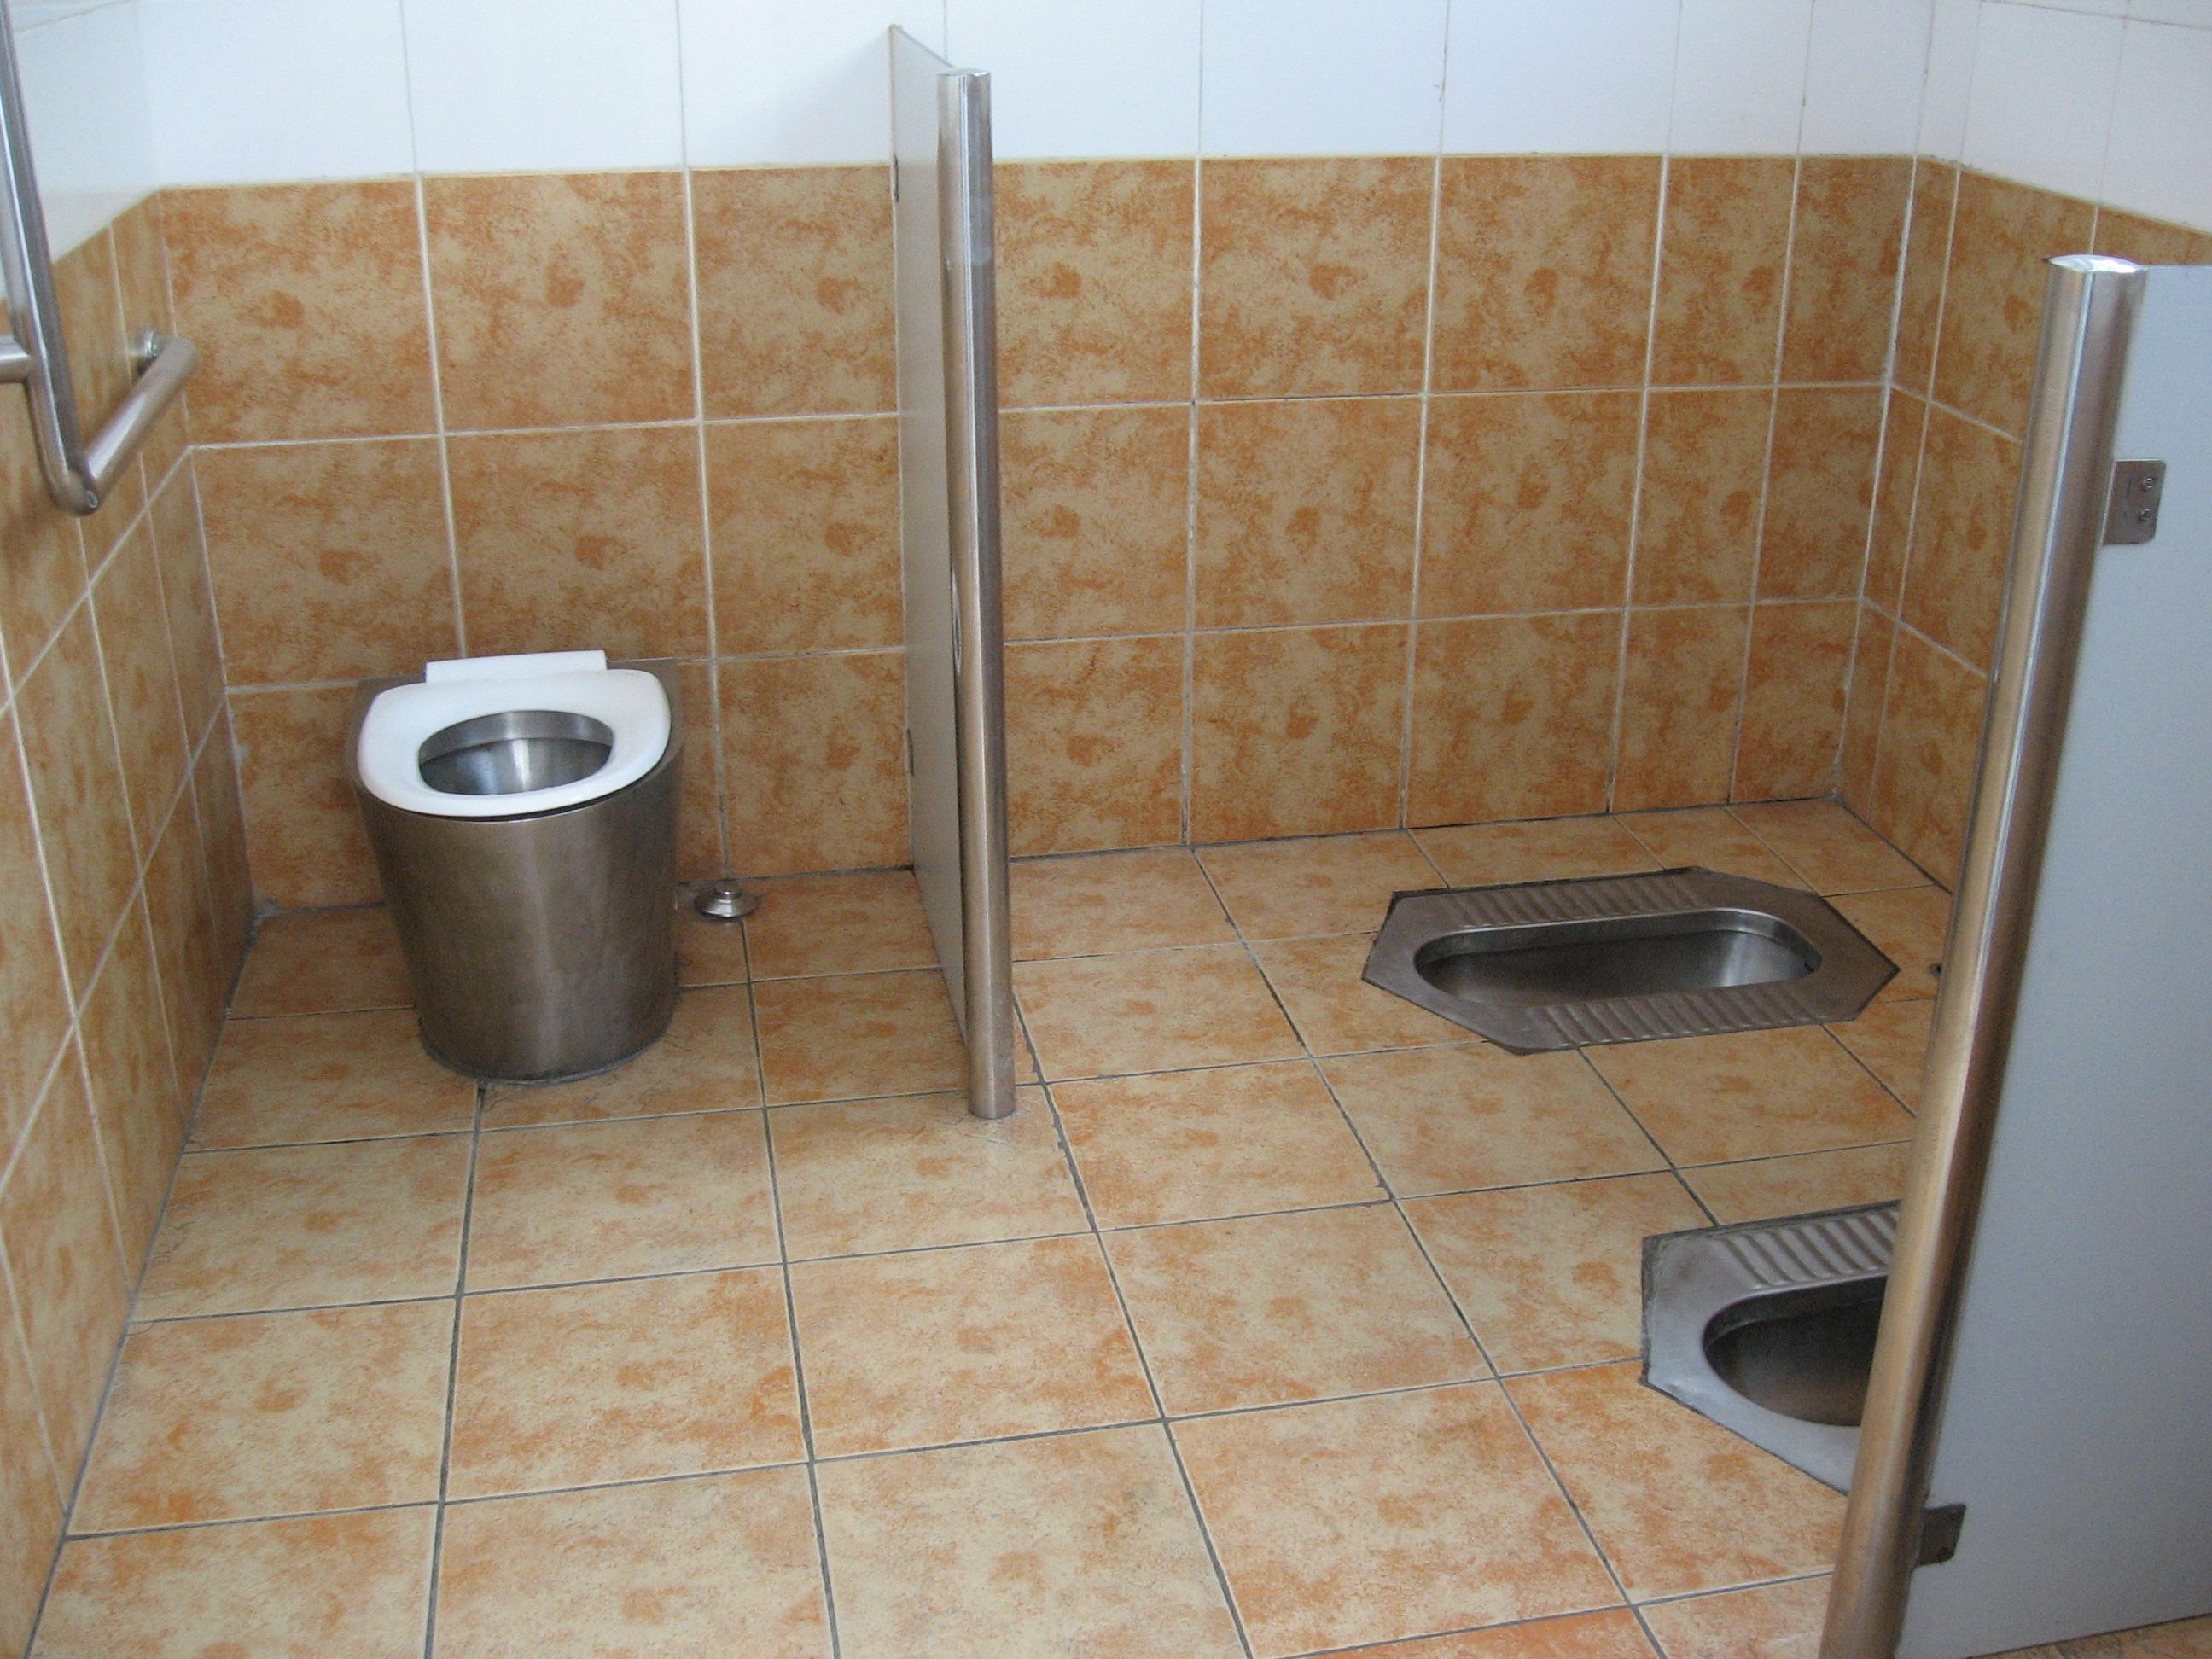 Summary of public toilet Part 7 8